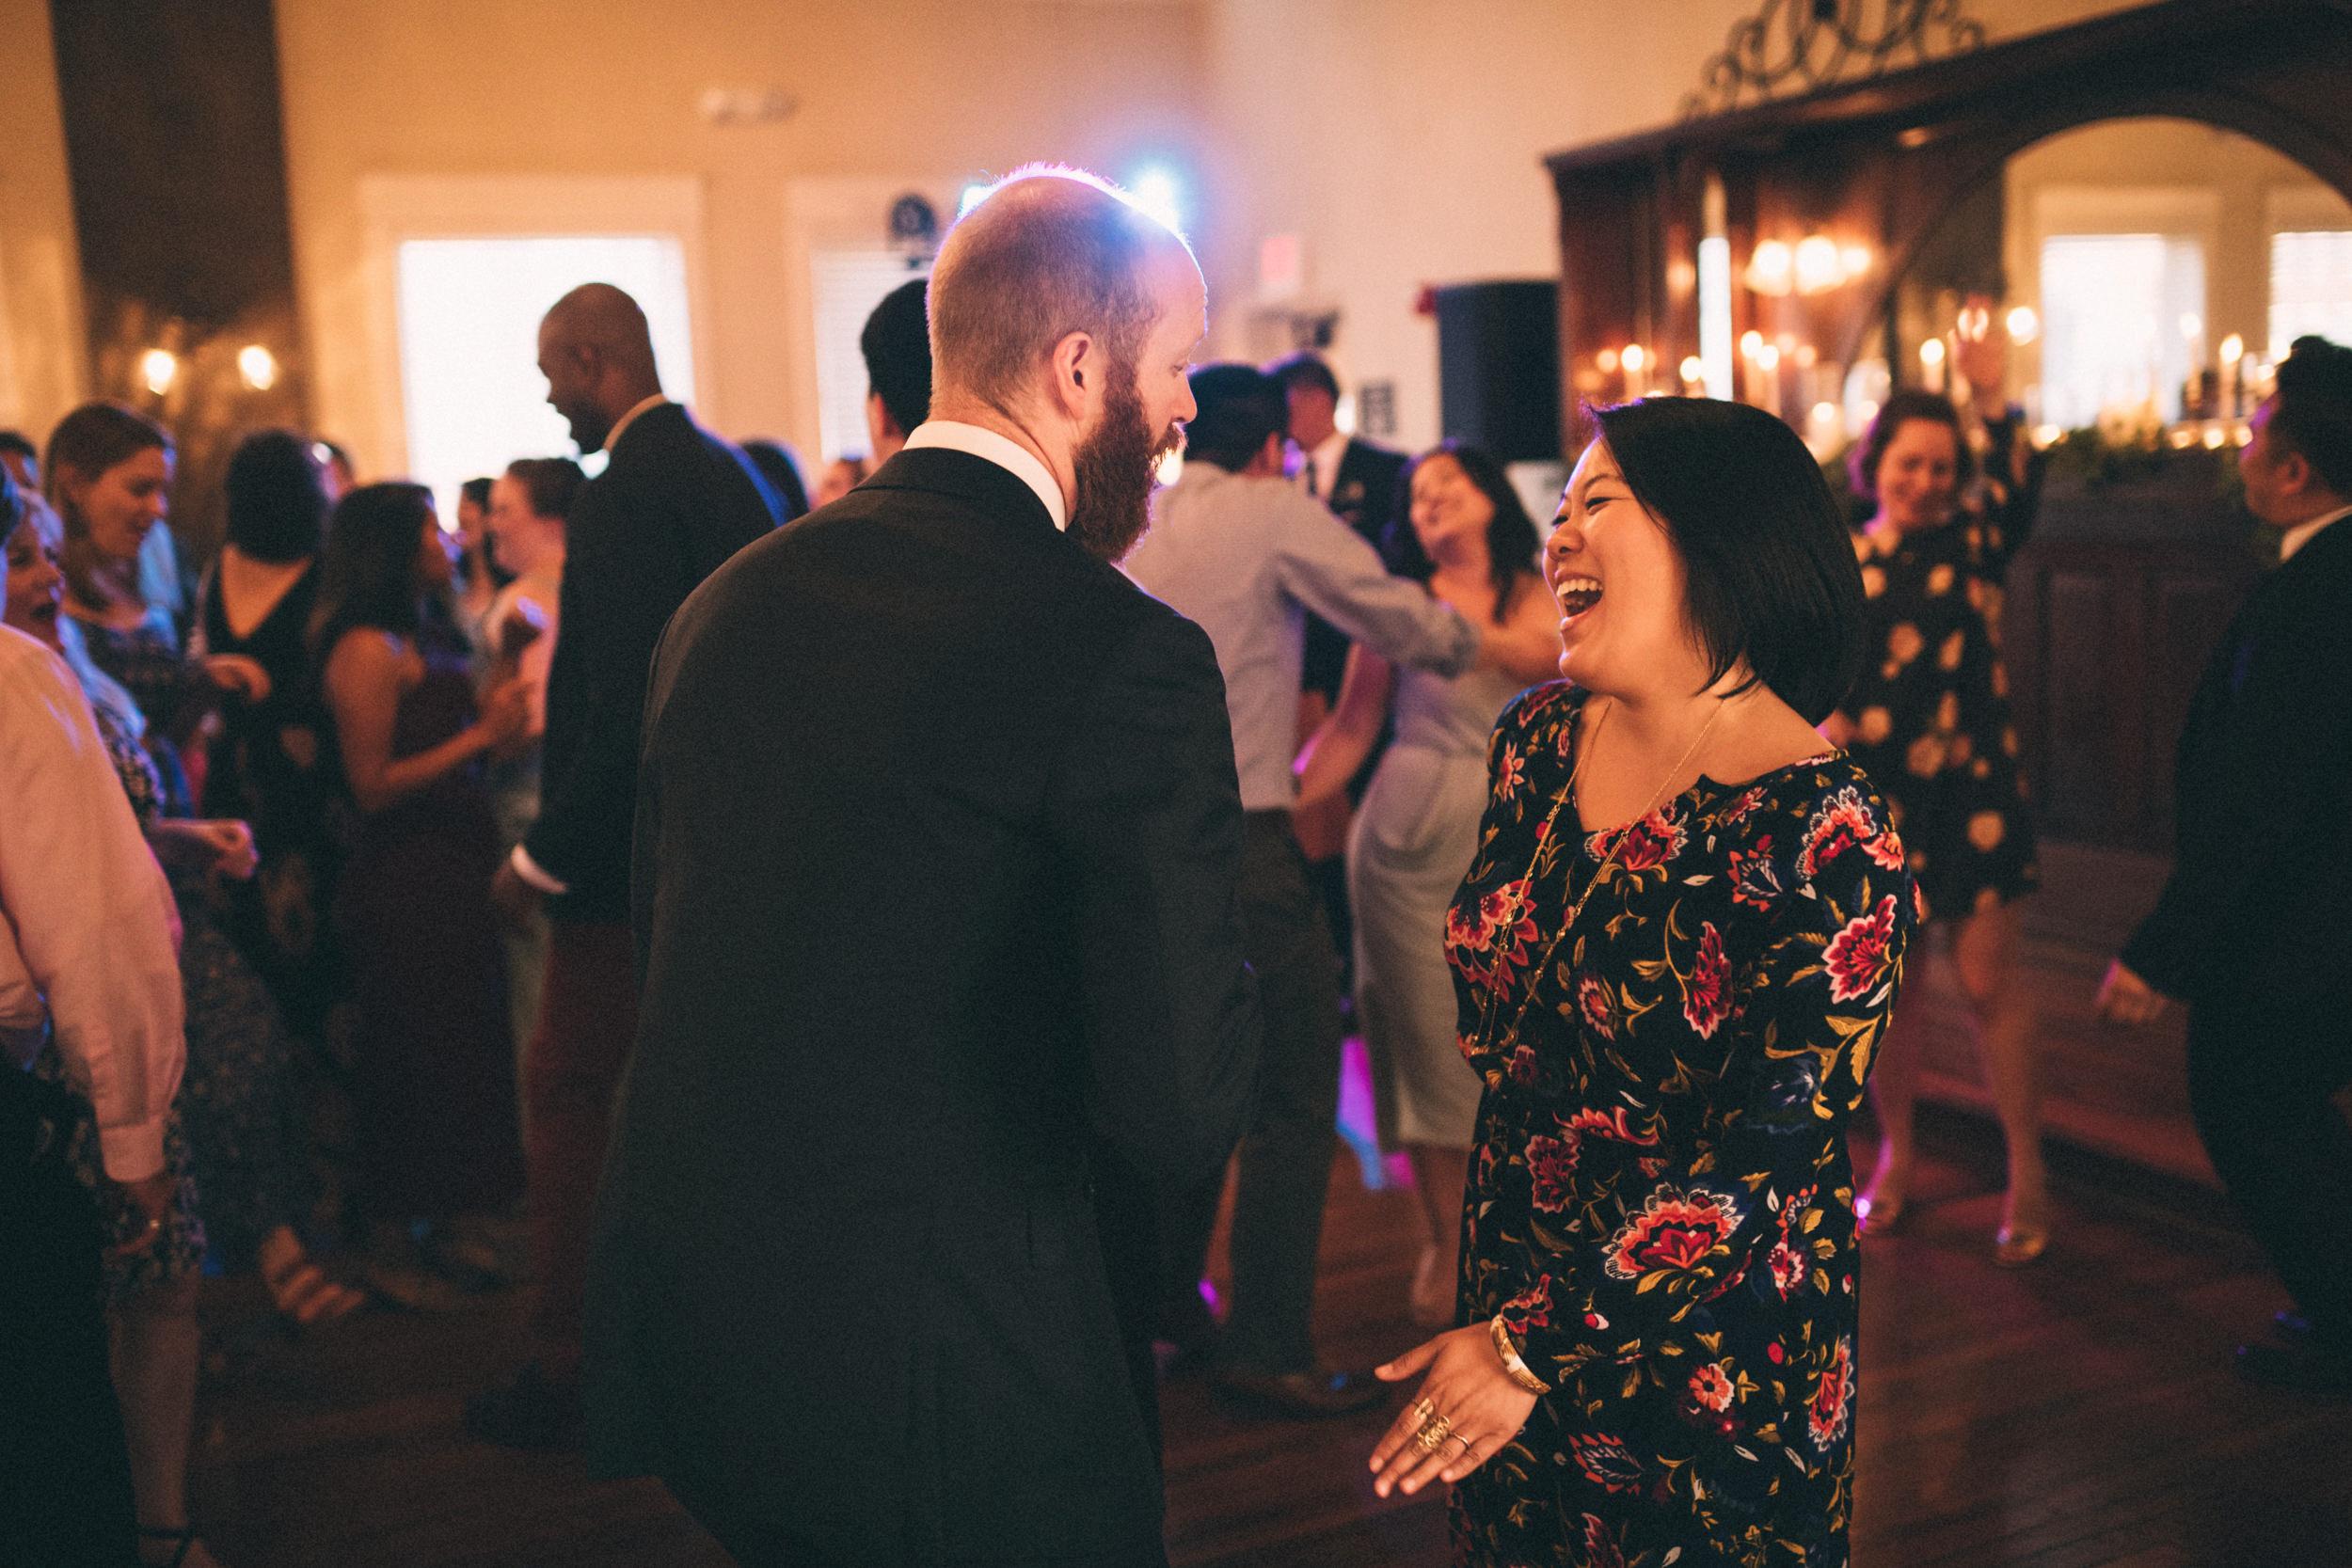 lauren-dean-wedding-grand-lodge-kentucky-sarah-katherine-davis-photography-608edit.jpg